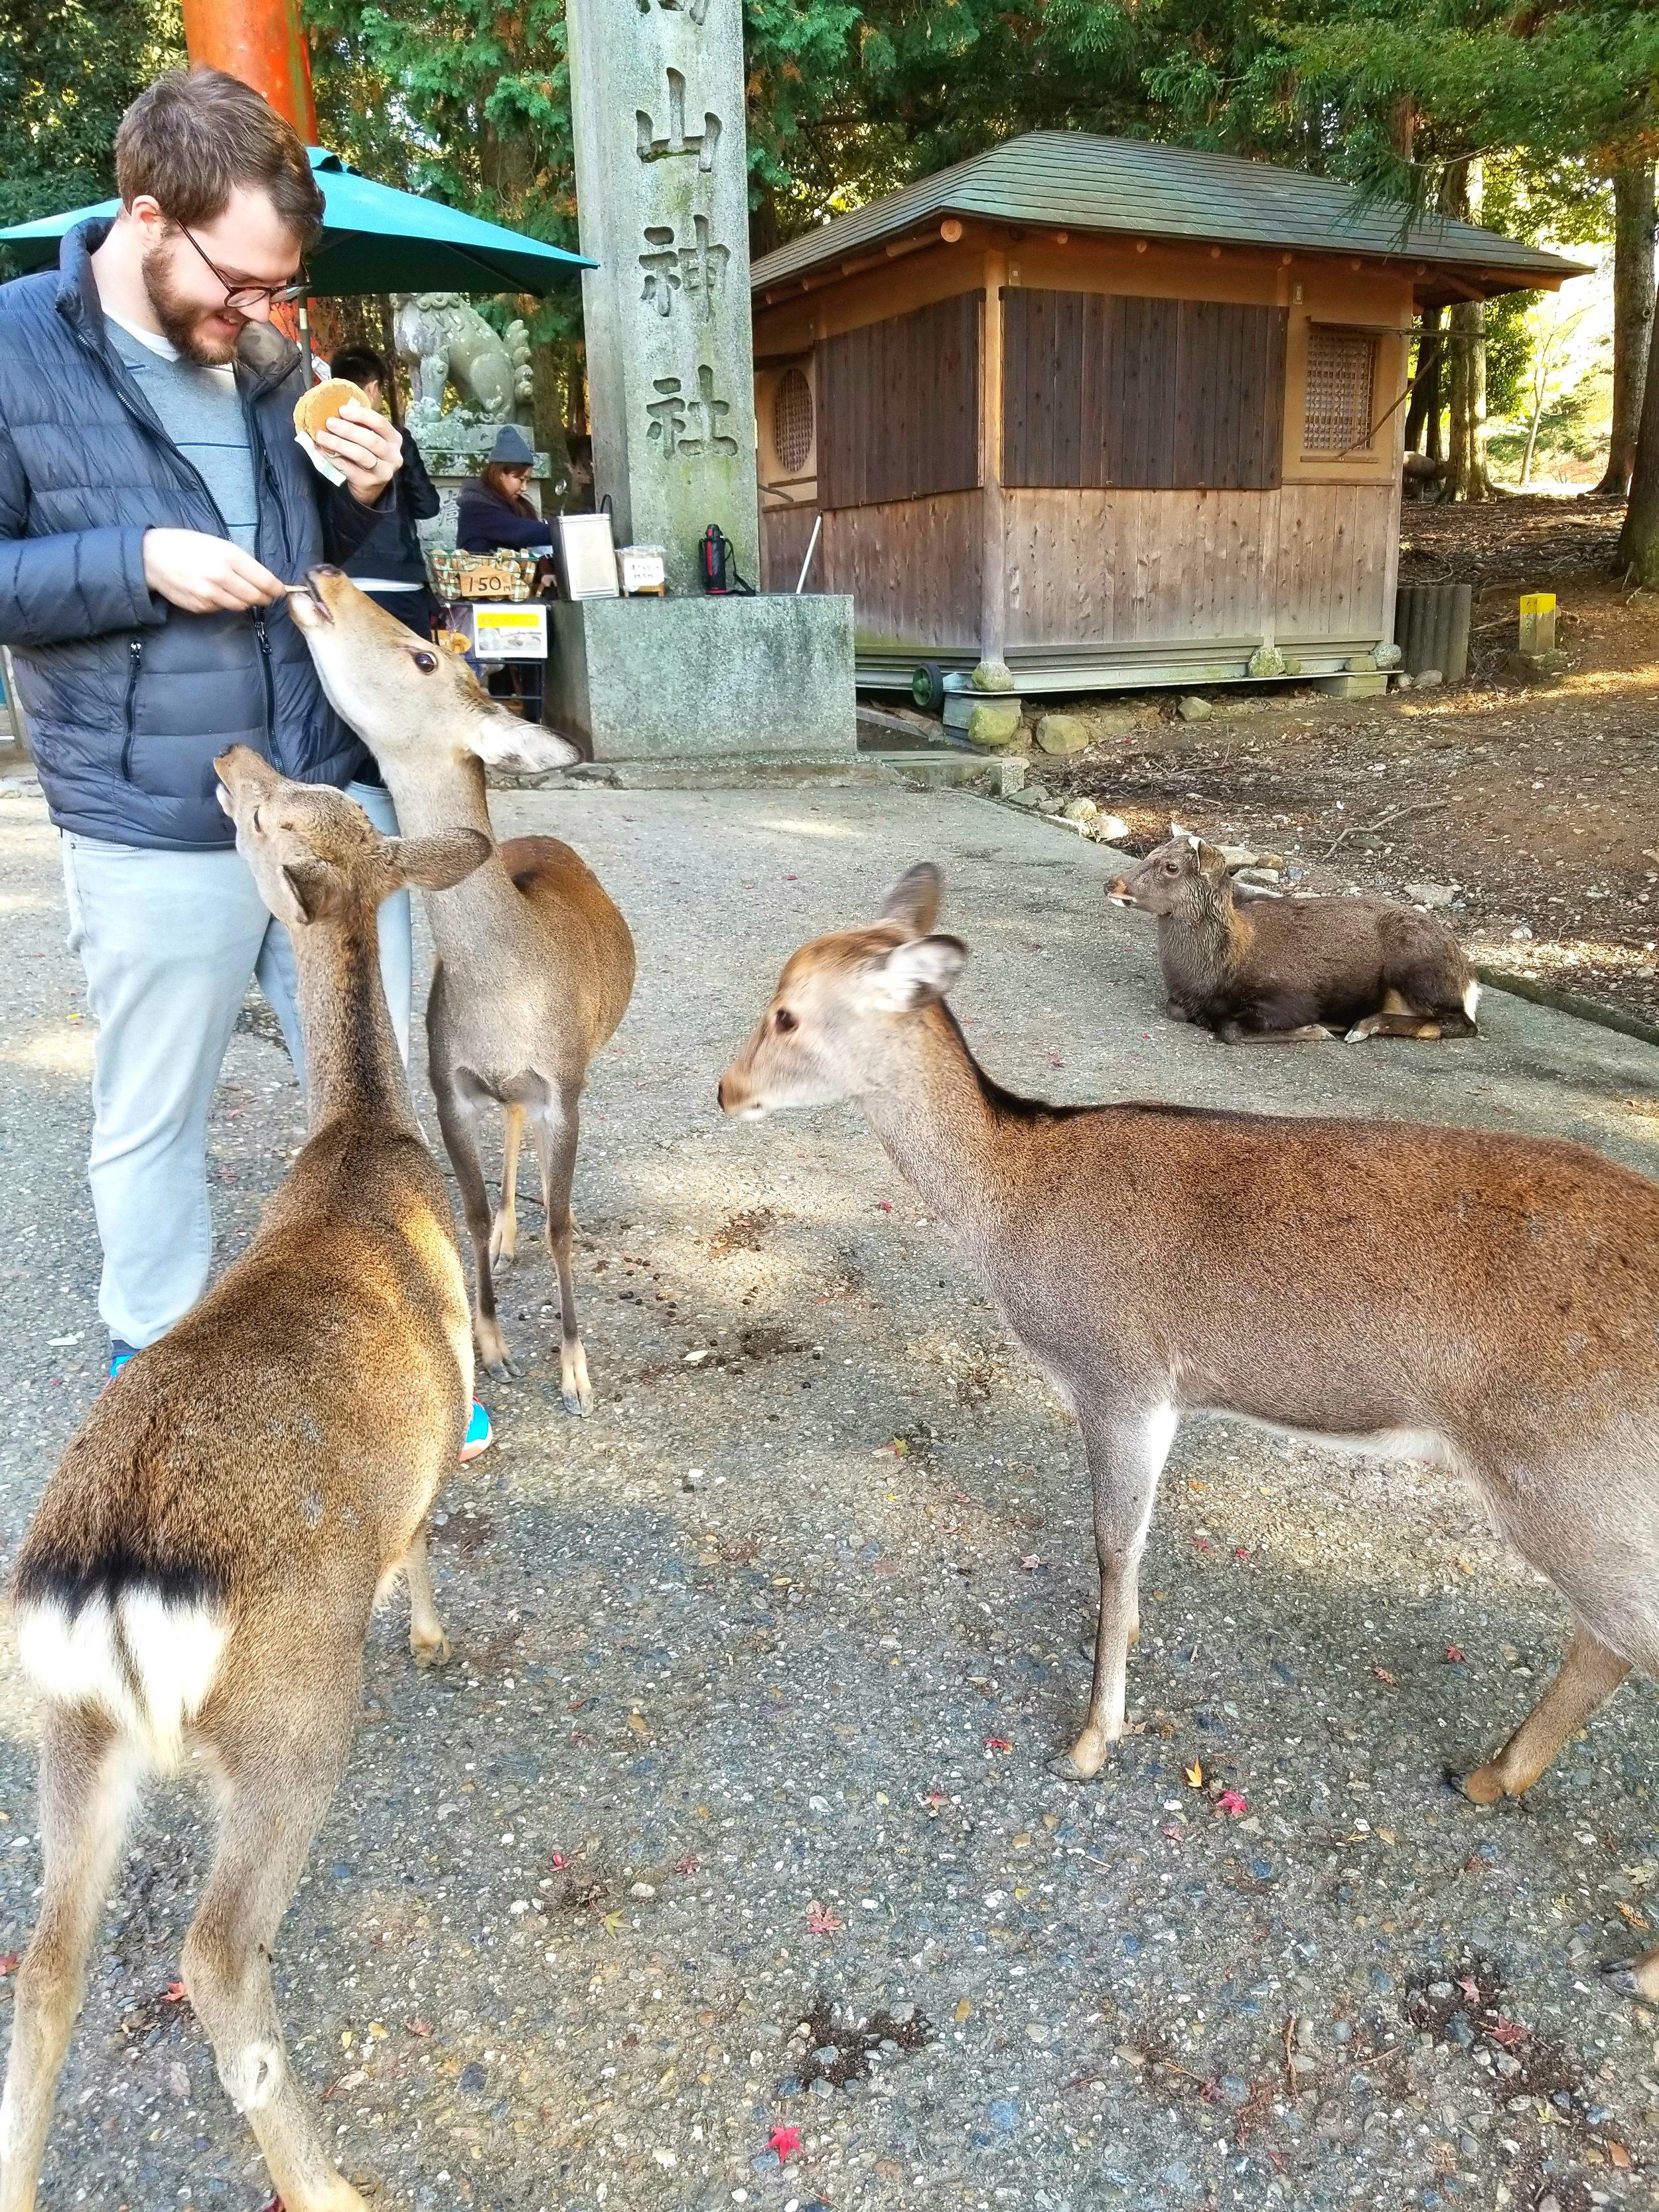 uprooted-traveler-deer-nara-park-vegan-guide-to-kyoto